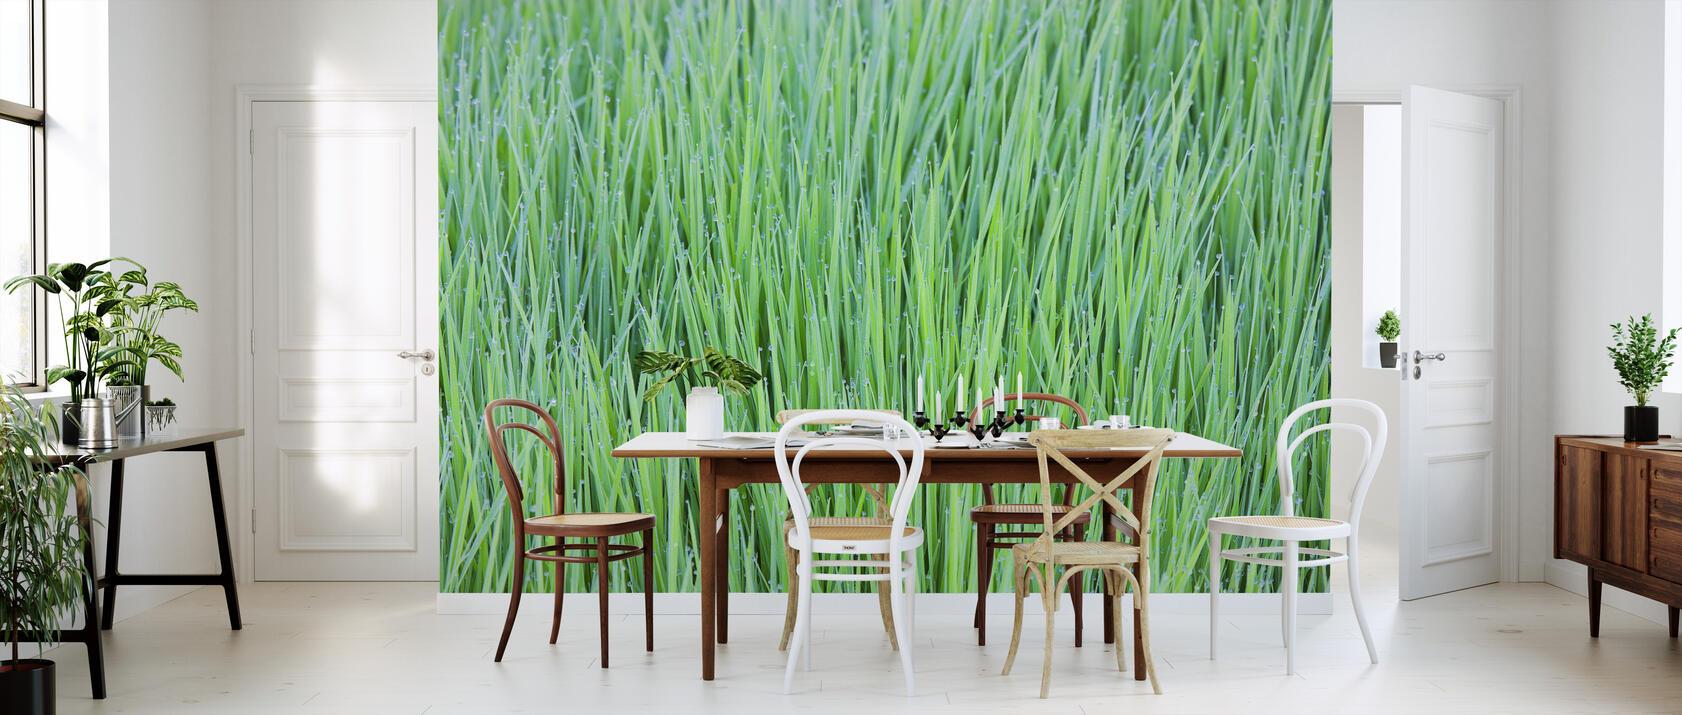 green trendige fototapete photowall. Black Bedroom Furniture Sets. Home Design Ideas